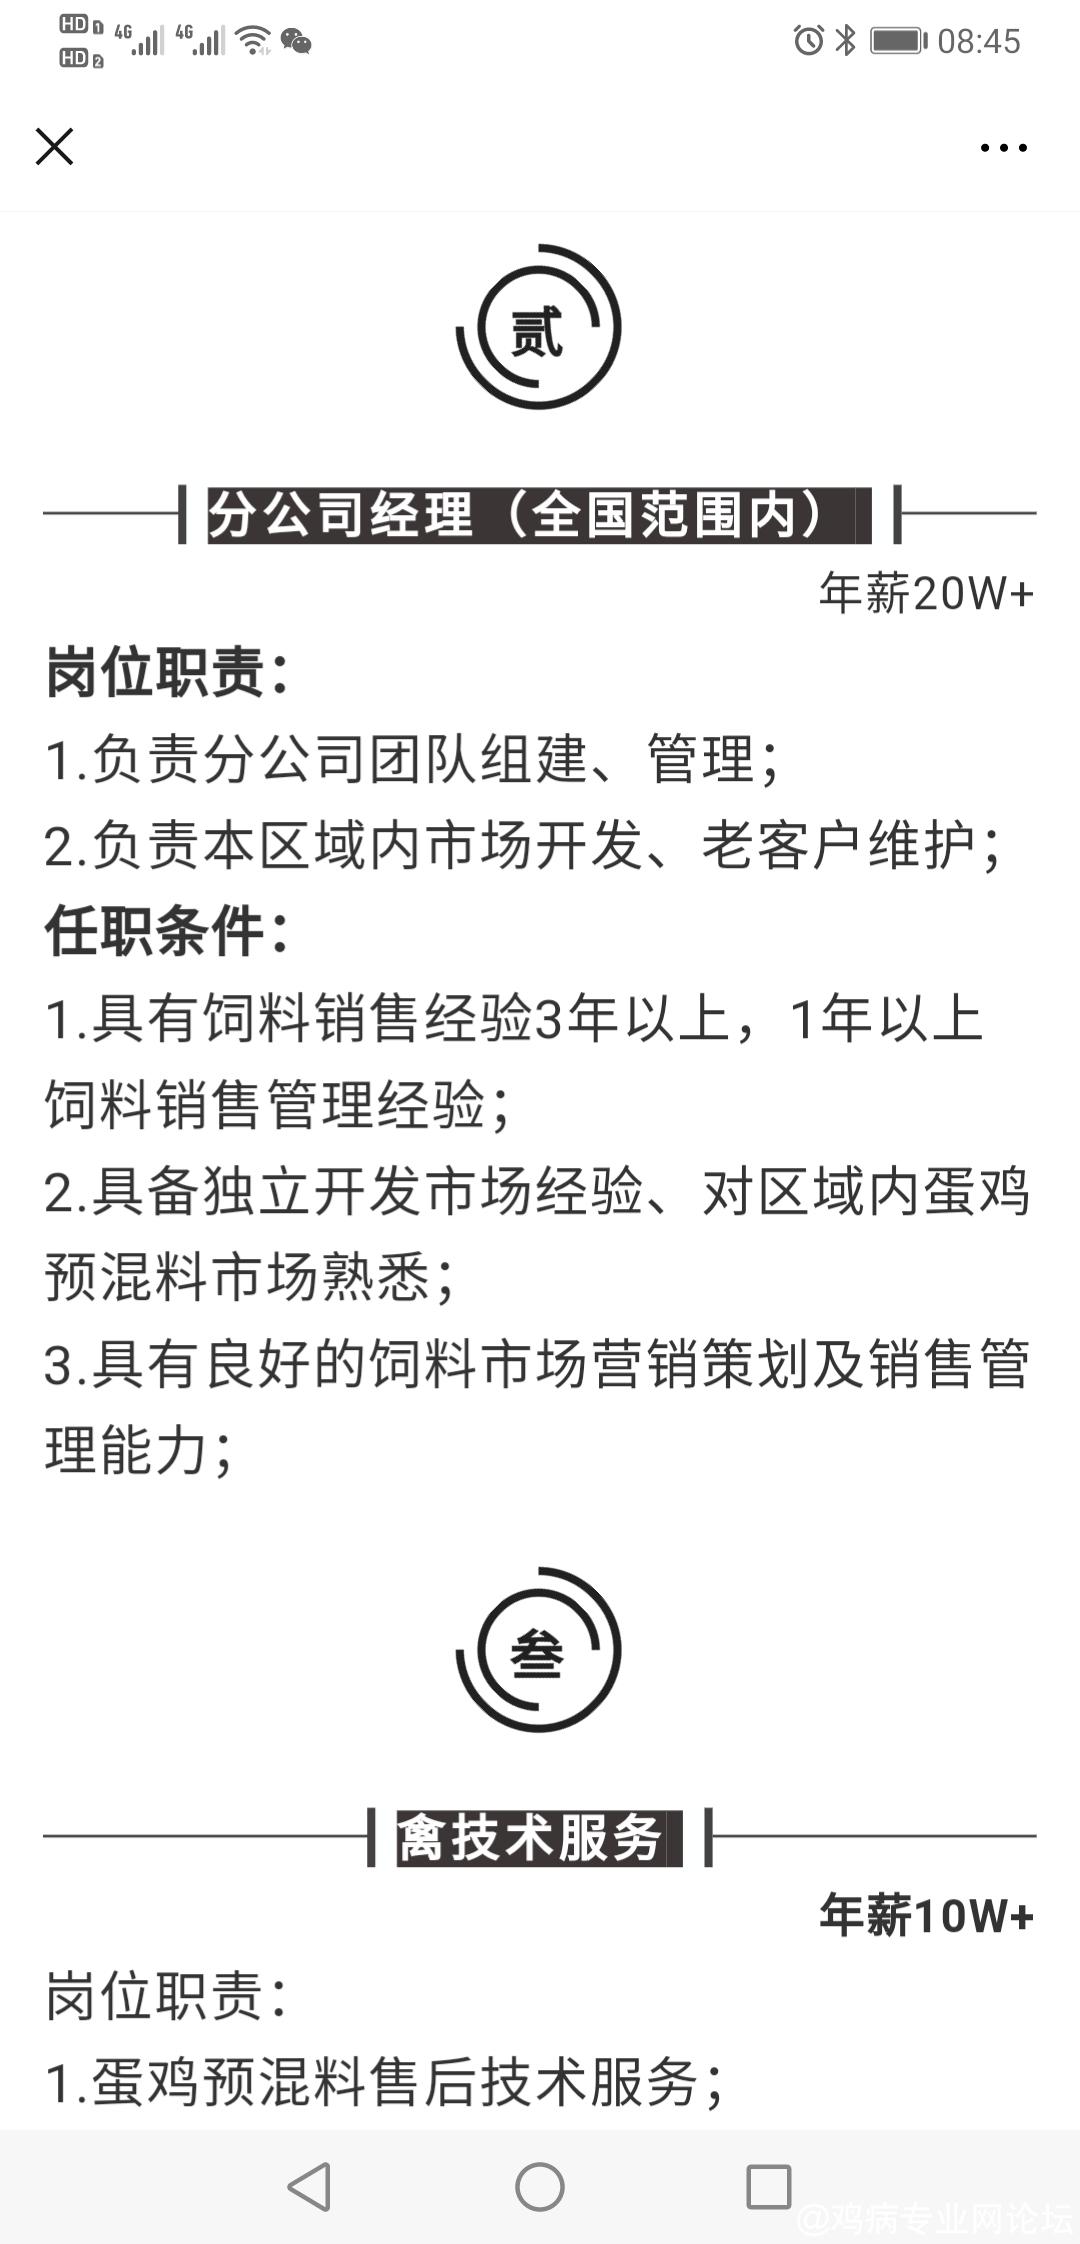 Screenshot_20200411_084505_com.tencent.mm.jpg